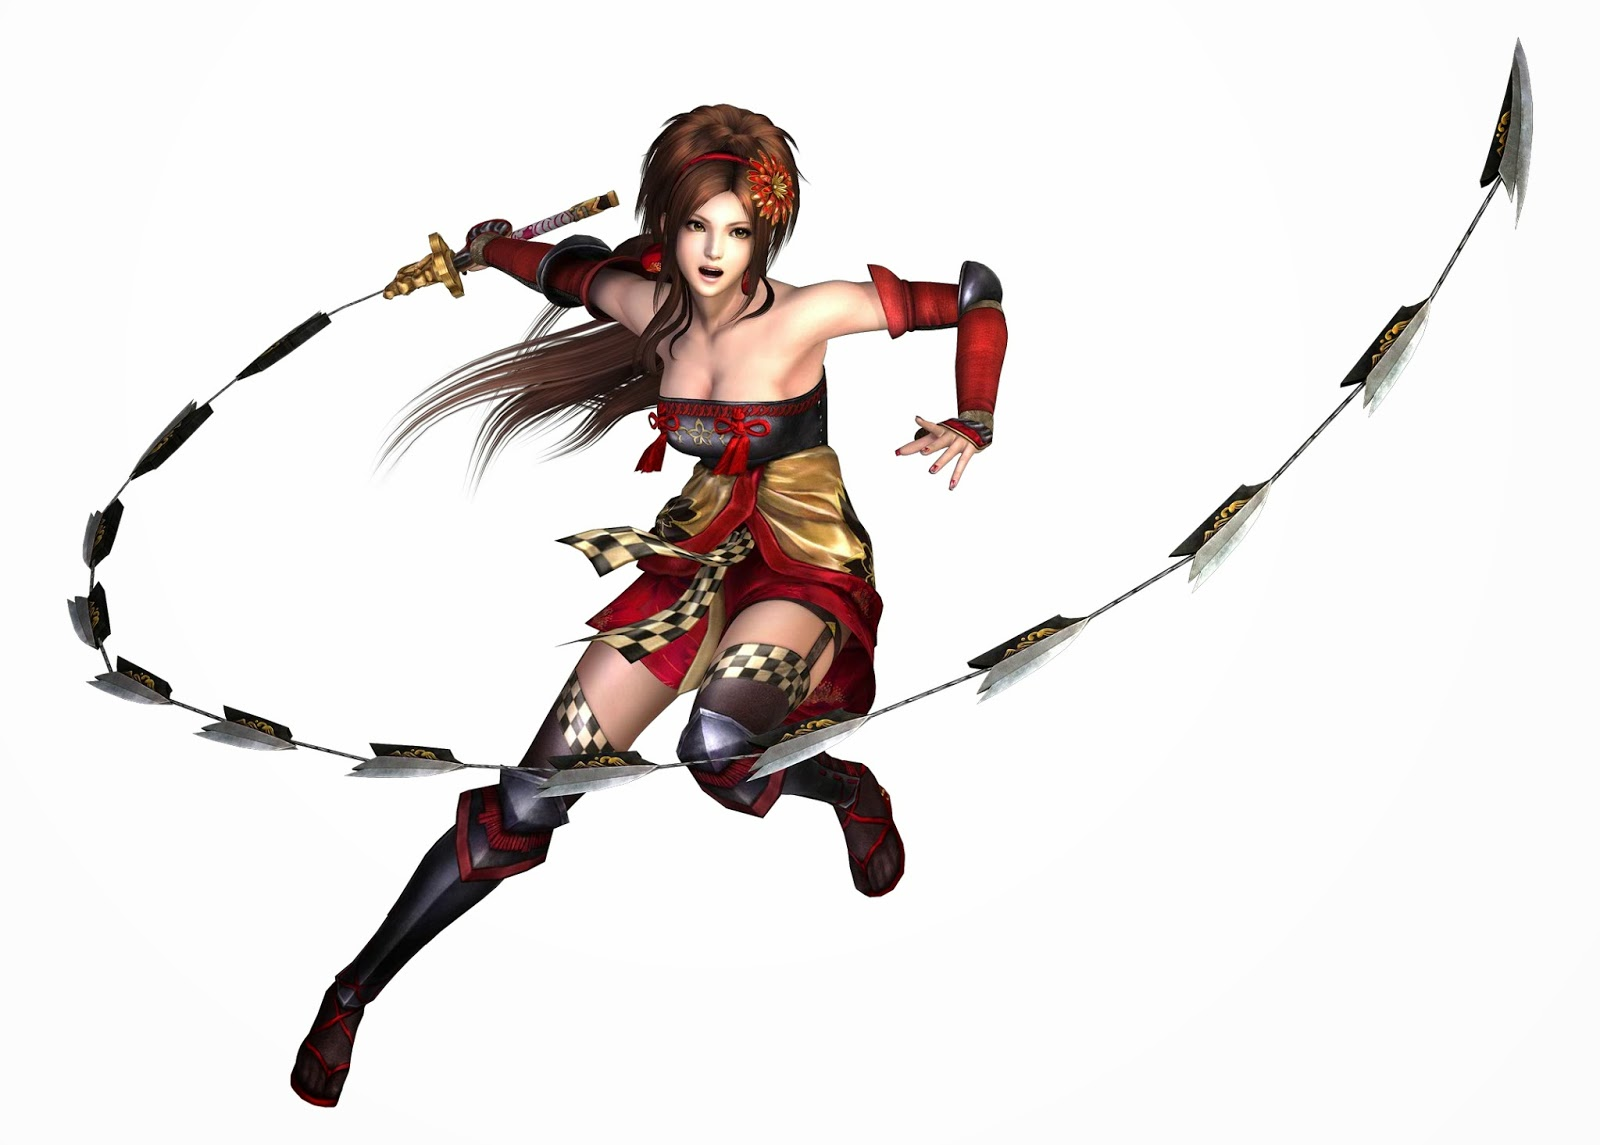 Samurai warriors erotic softcore interracial wifes